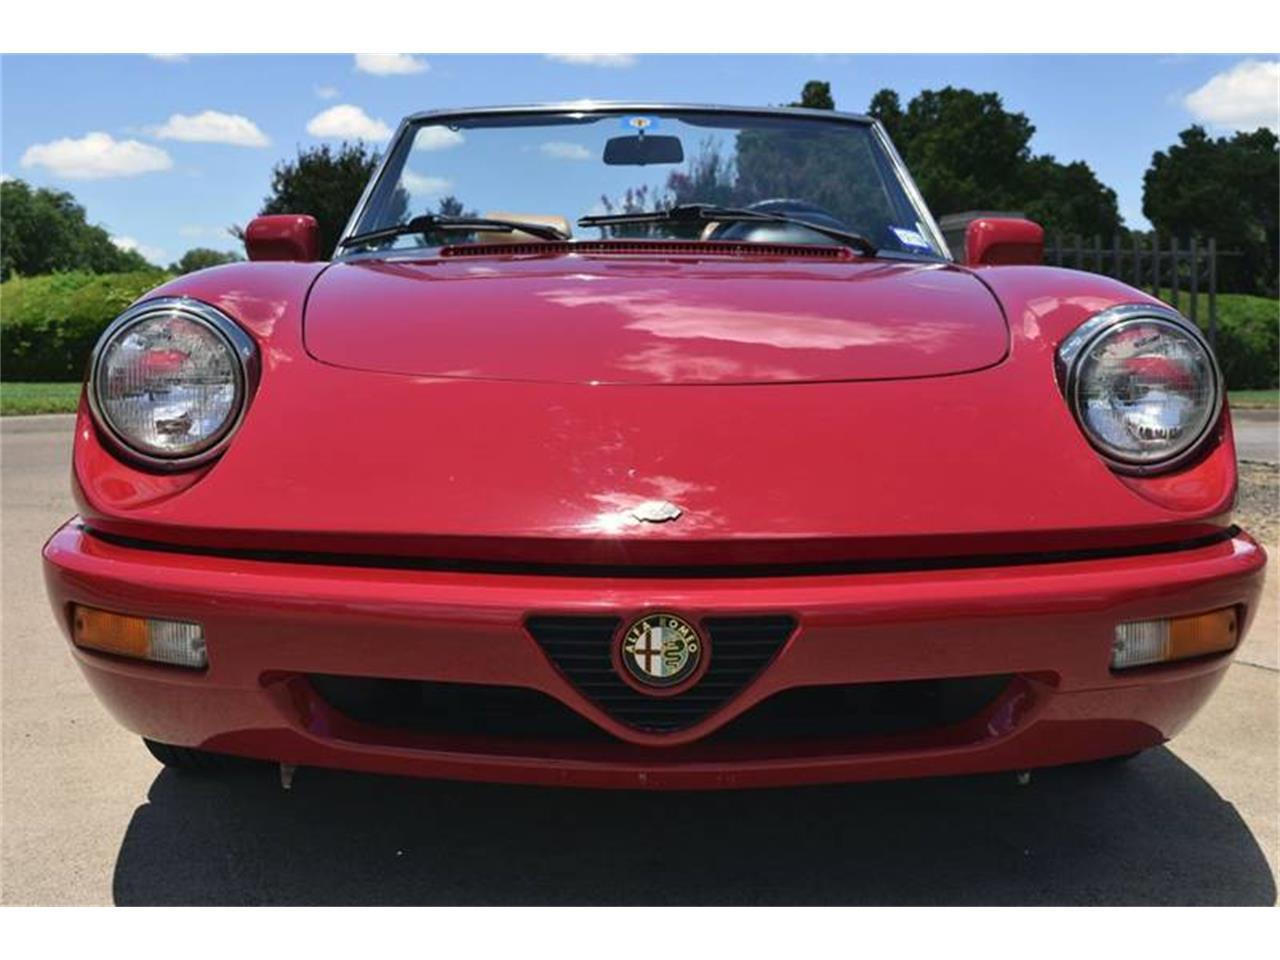 Alfa Romeo Spider For Sale ClassicCarscom CC - Alfa romeo spider 1994